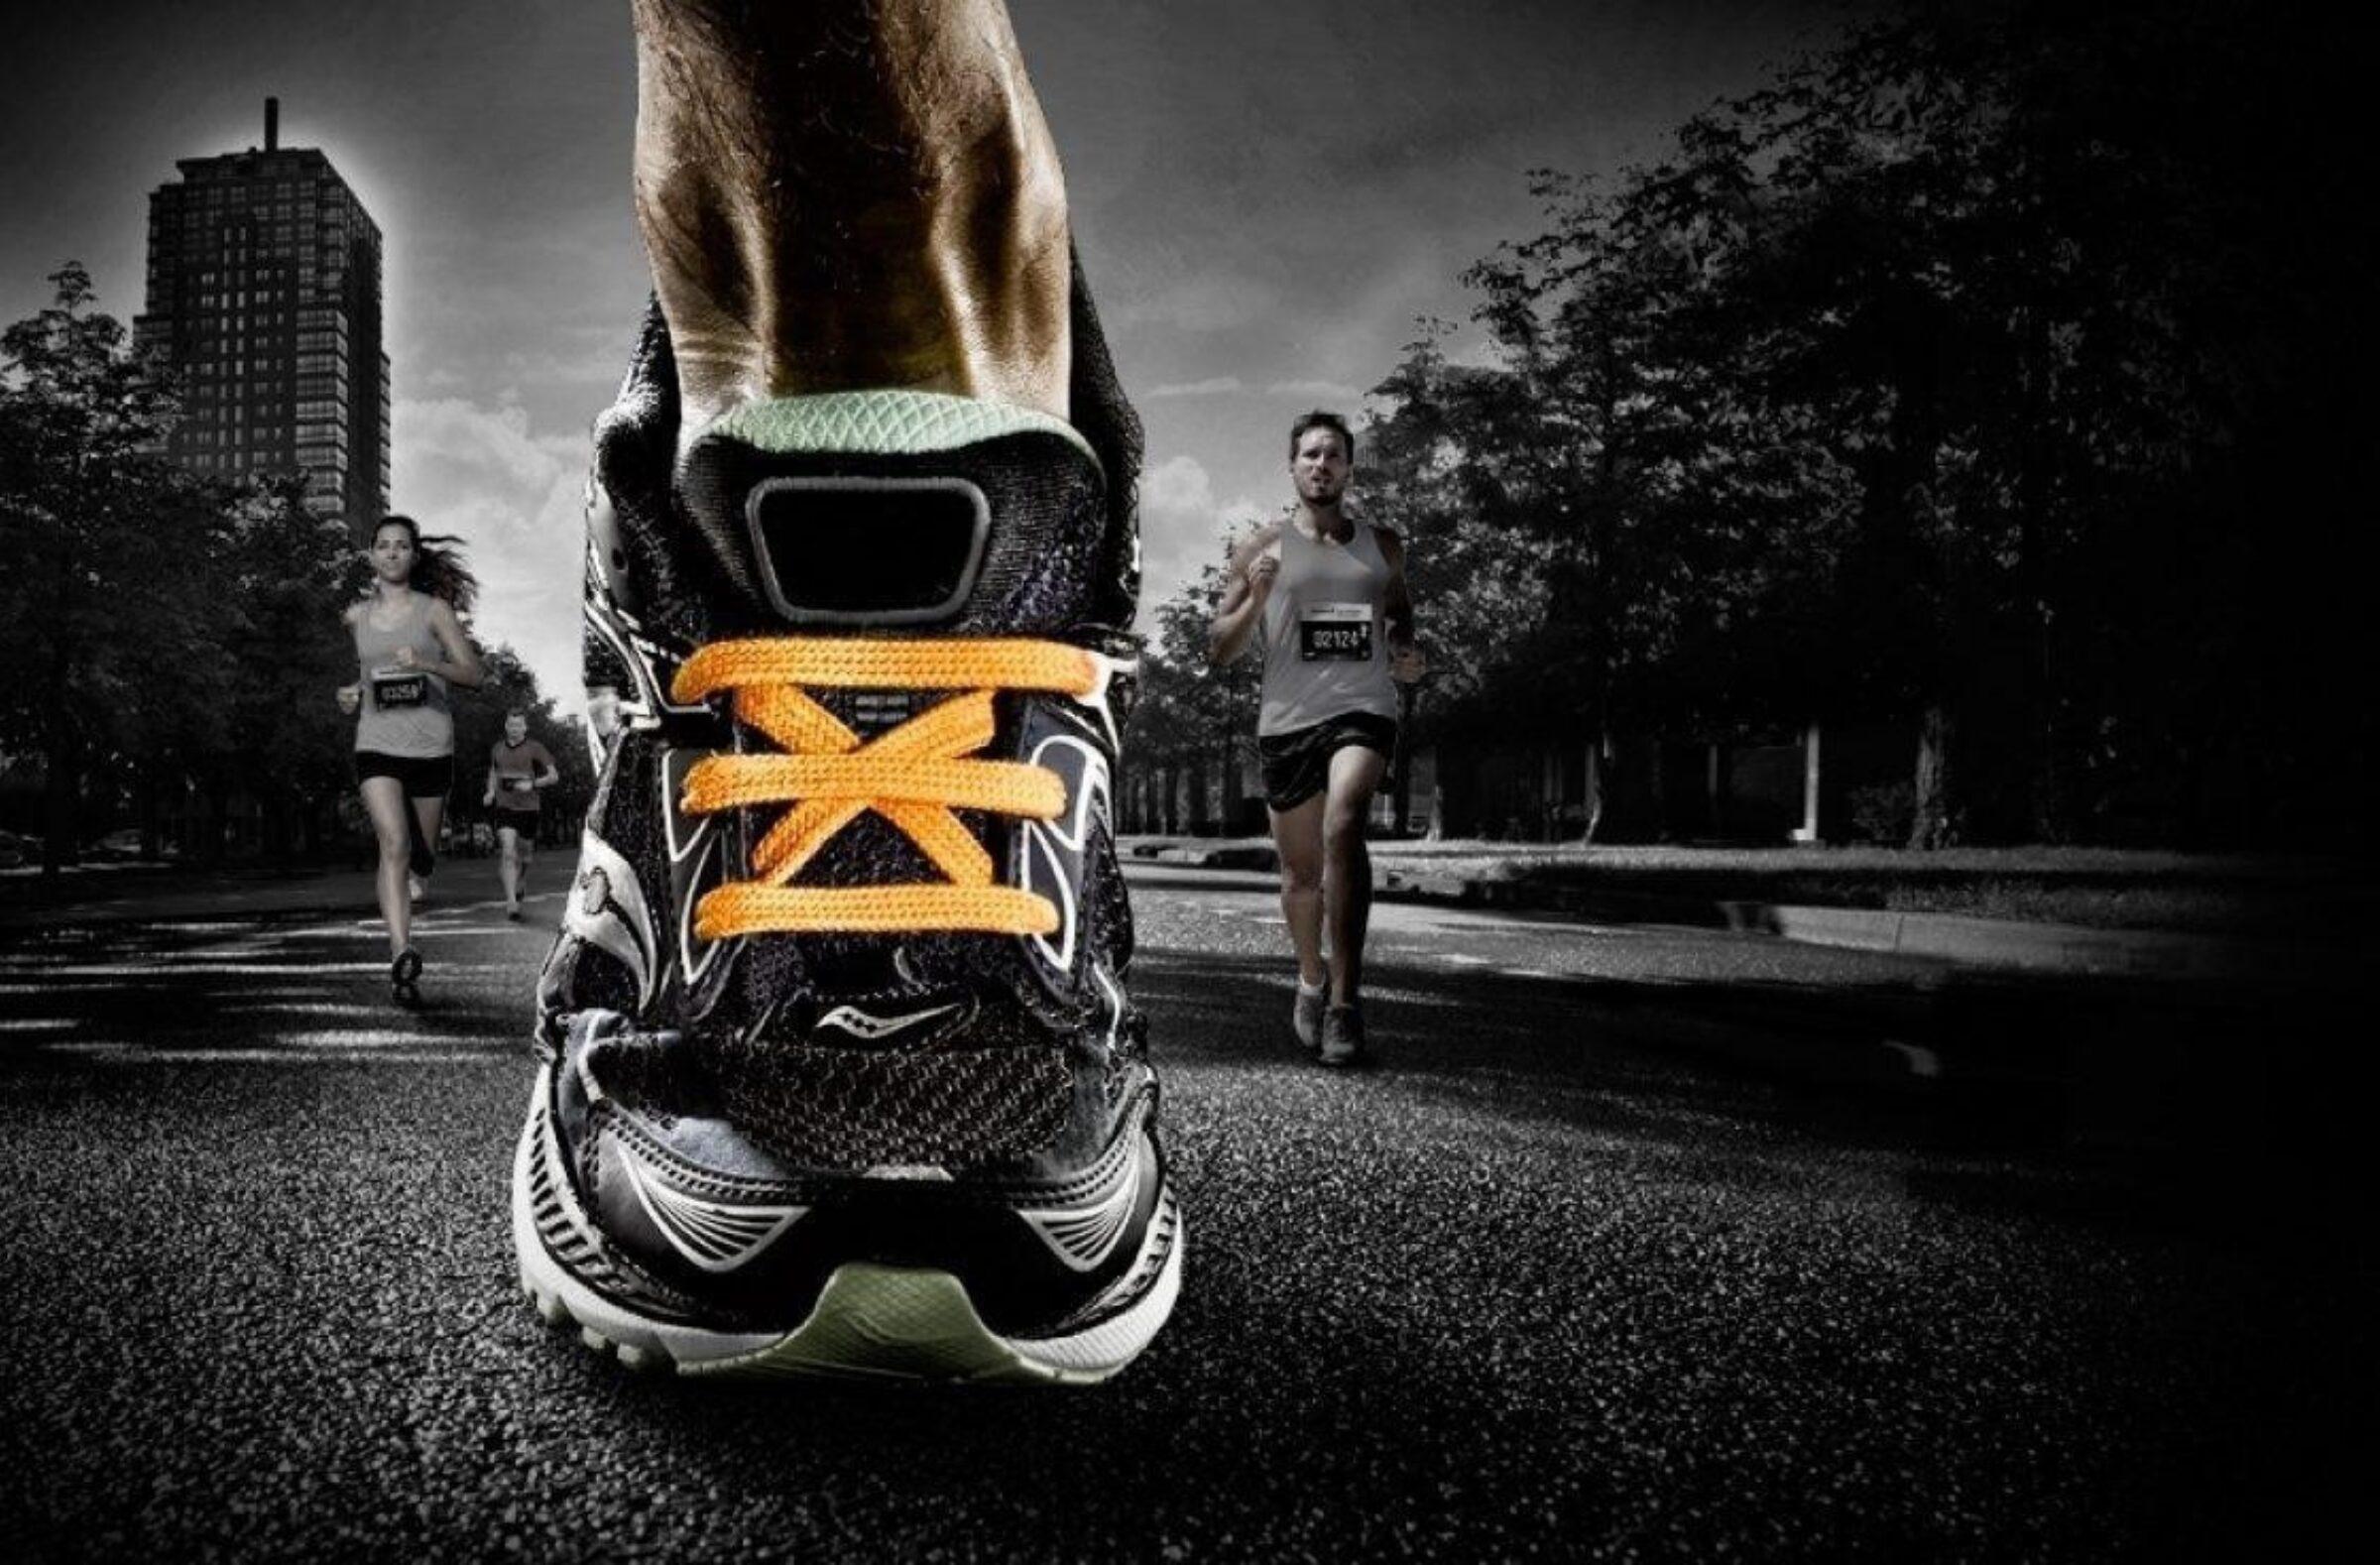 Enschede marathon 190107 153437 1978 1546871676 35hxayqhb4